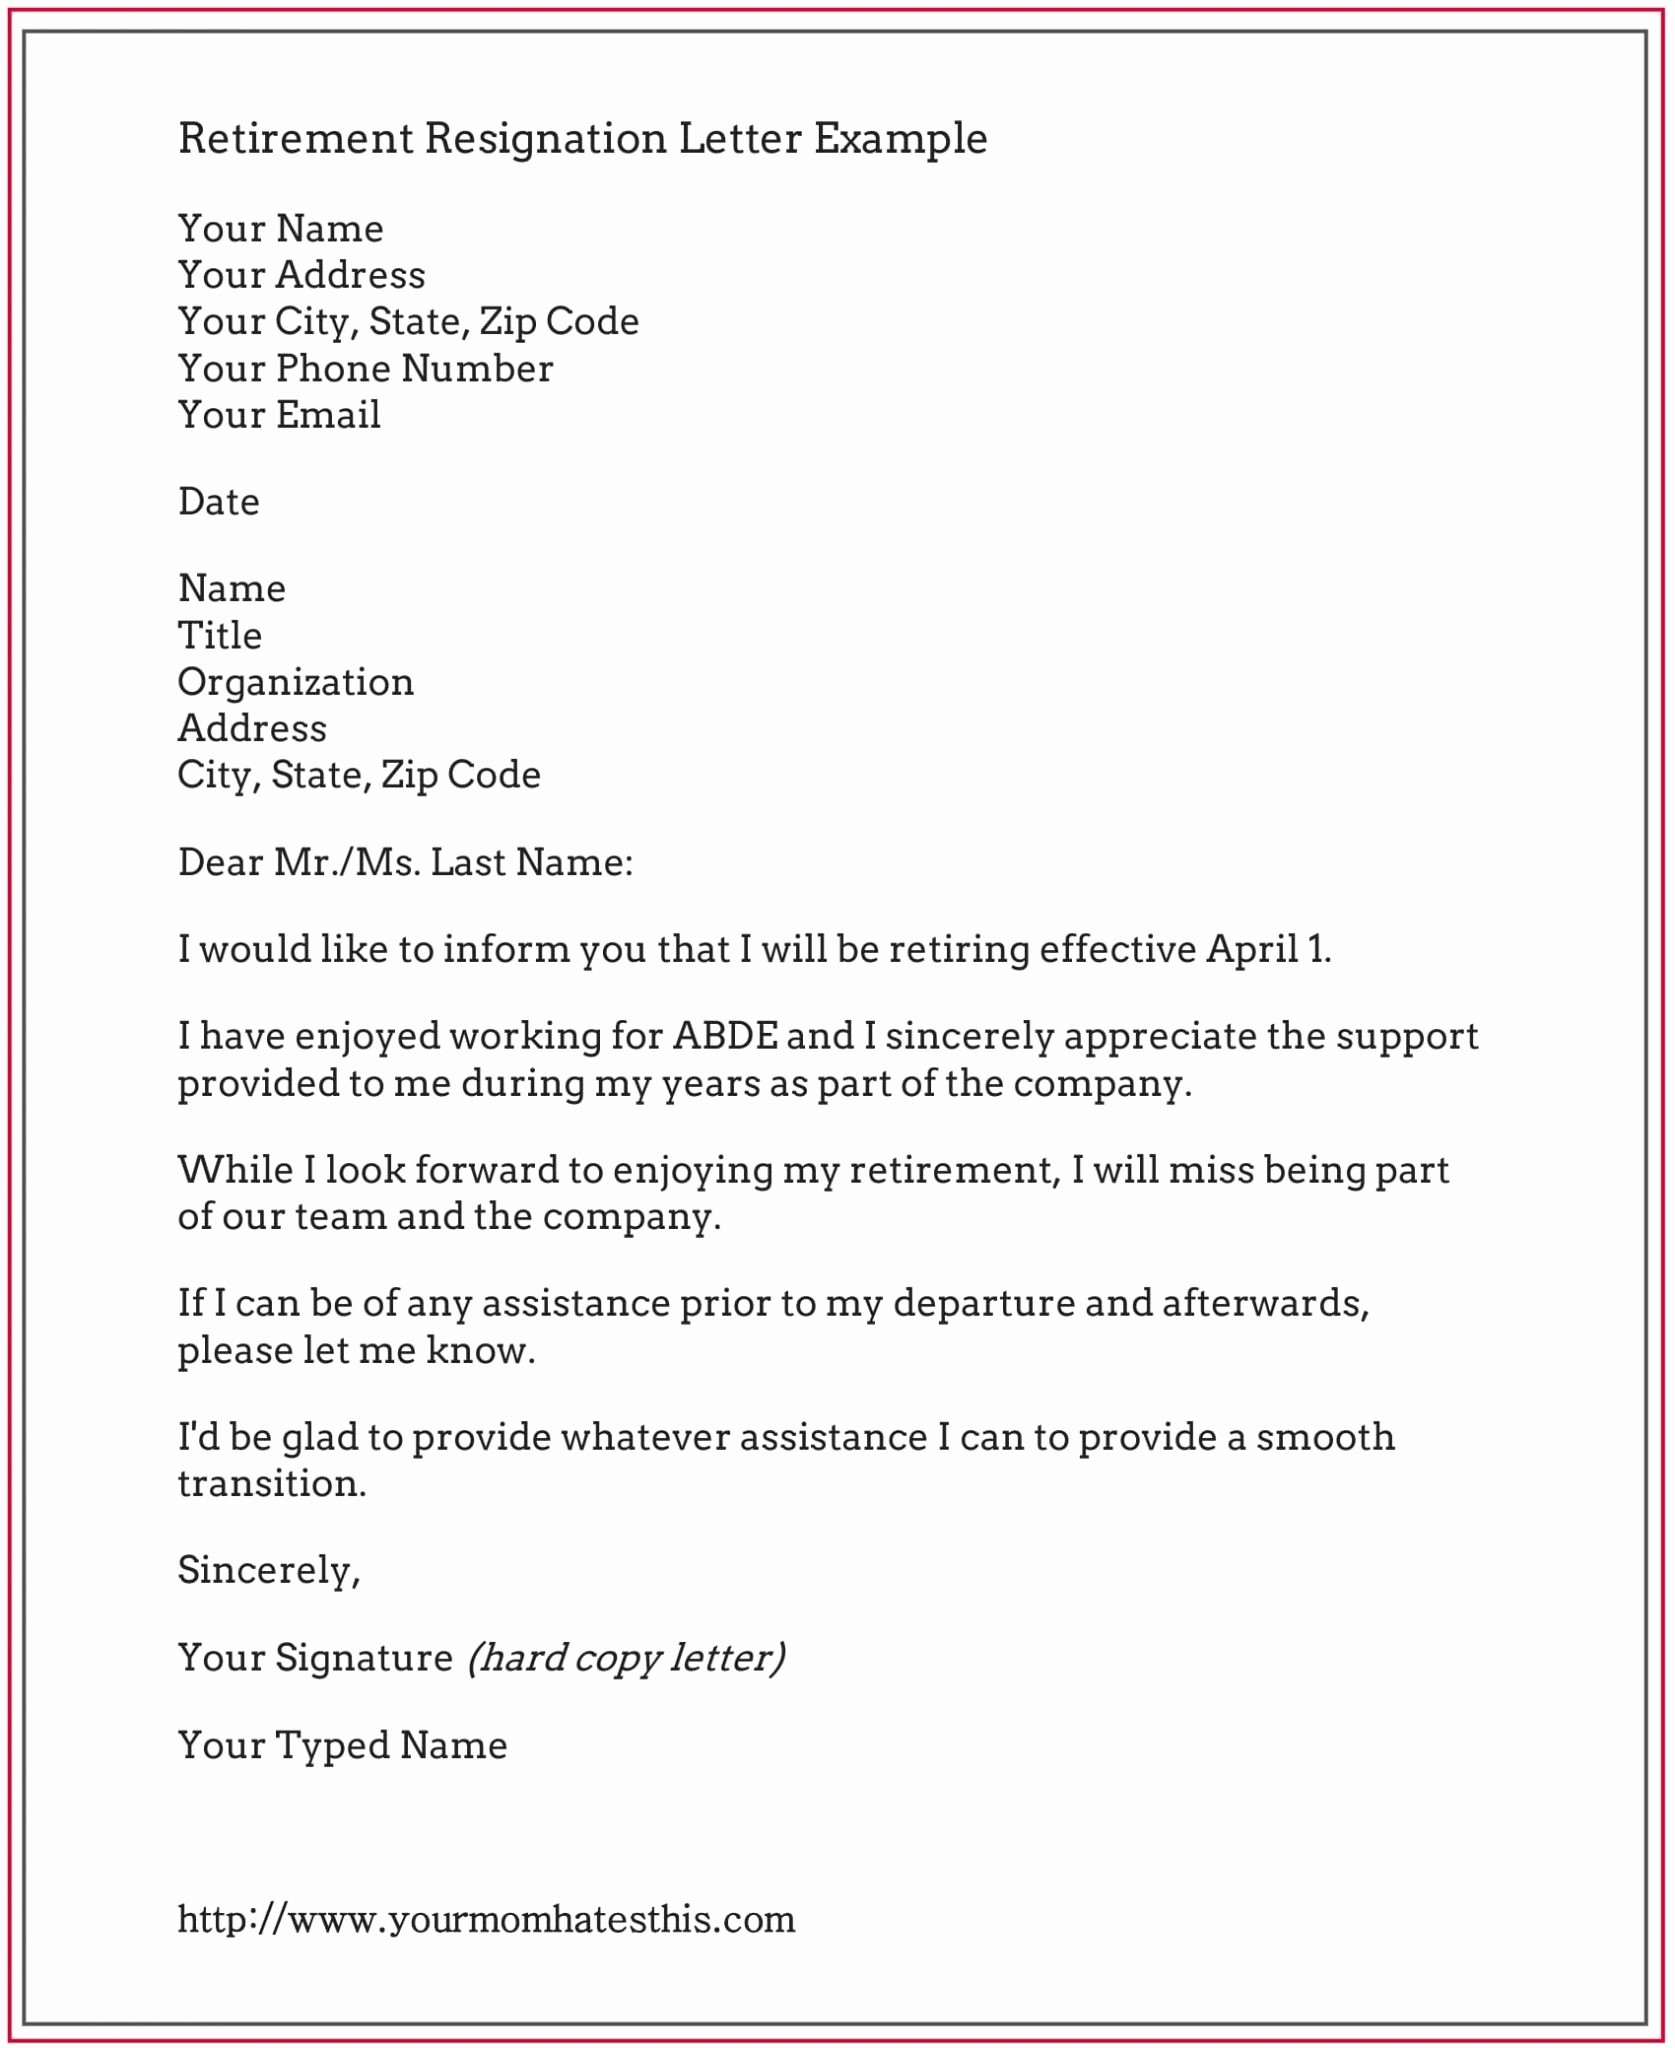 Letter Of Resignation Retirement Example Luxury